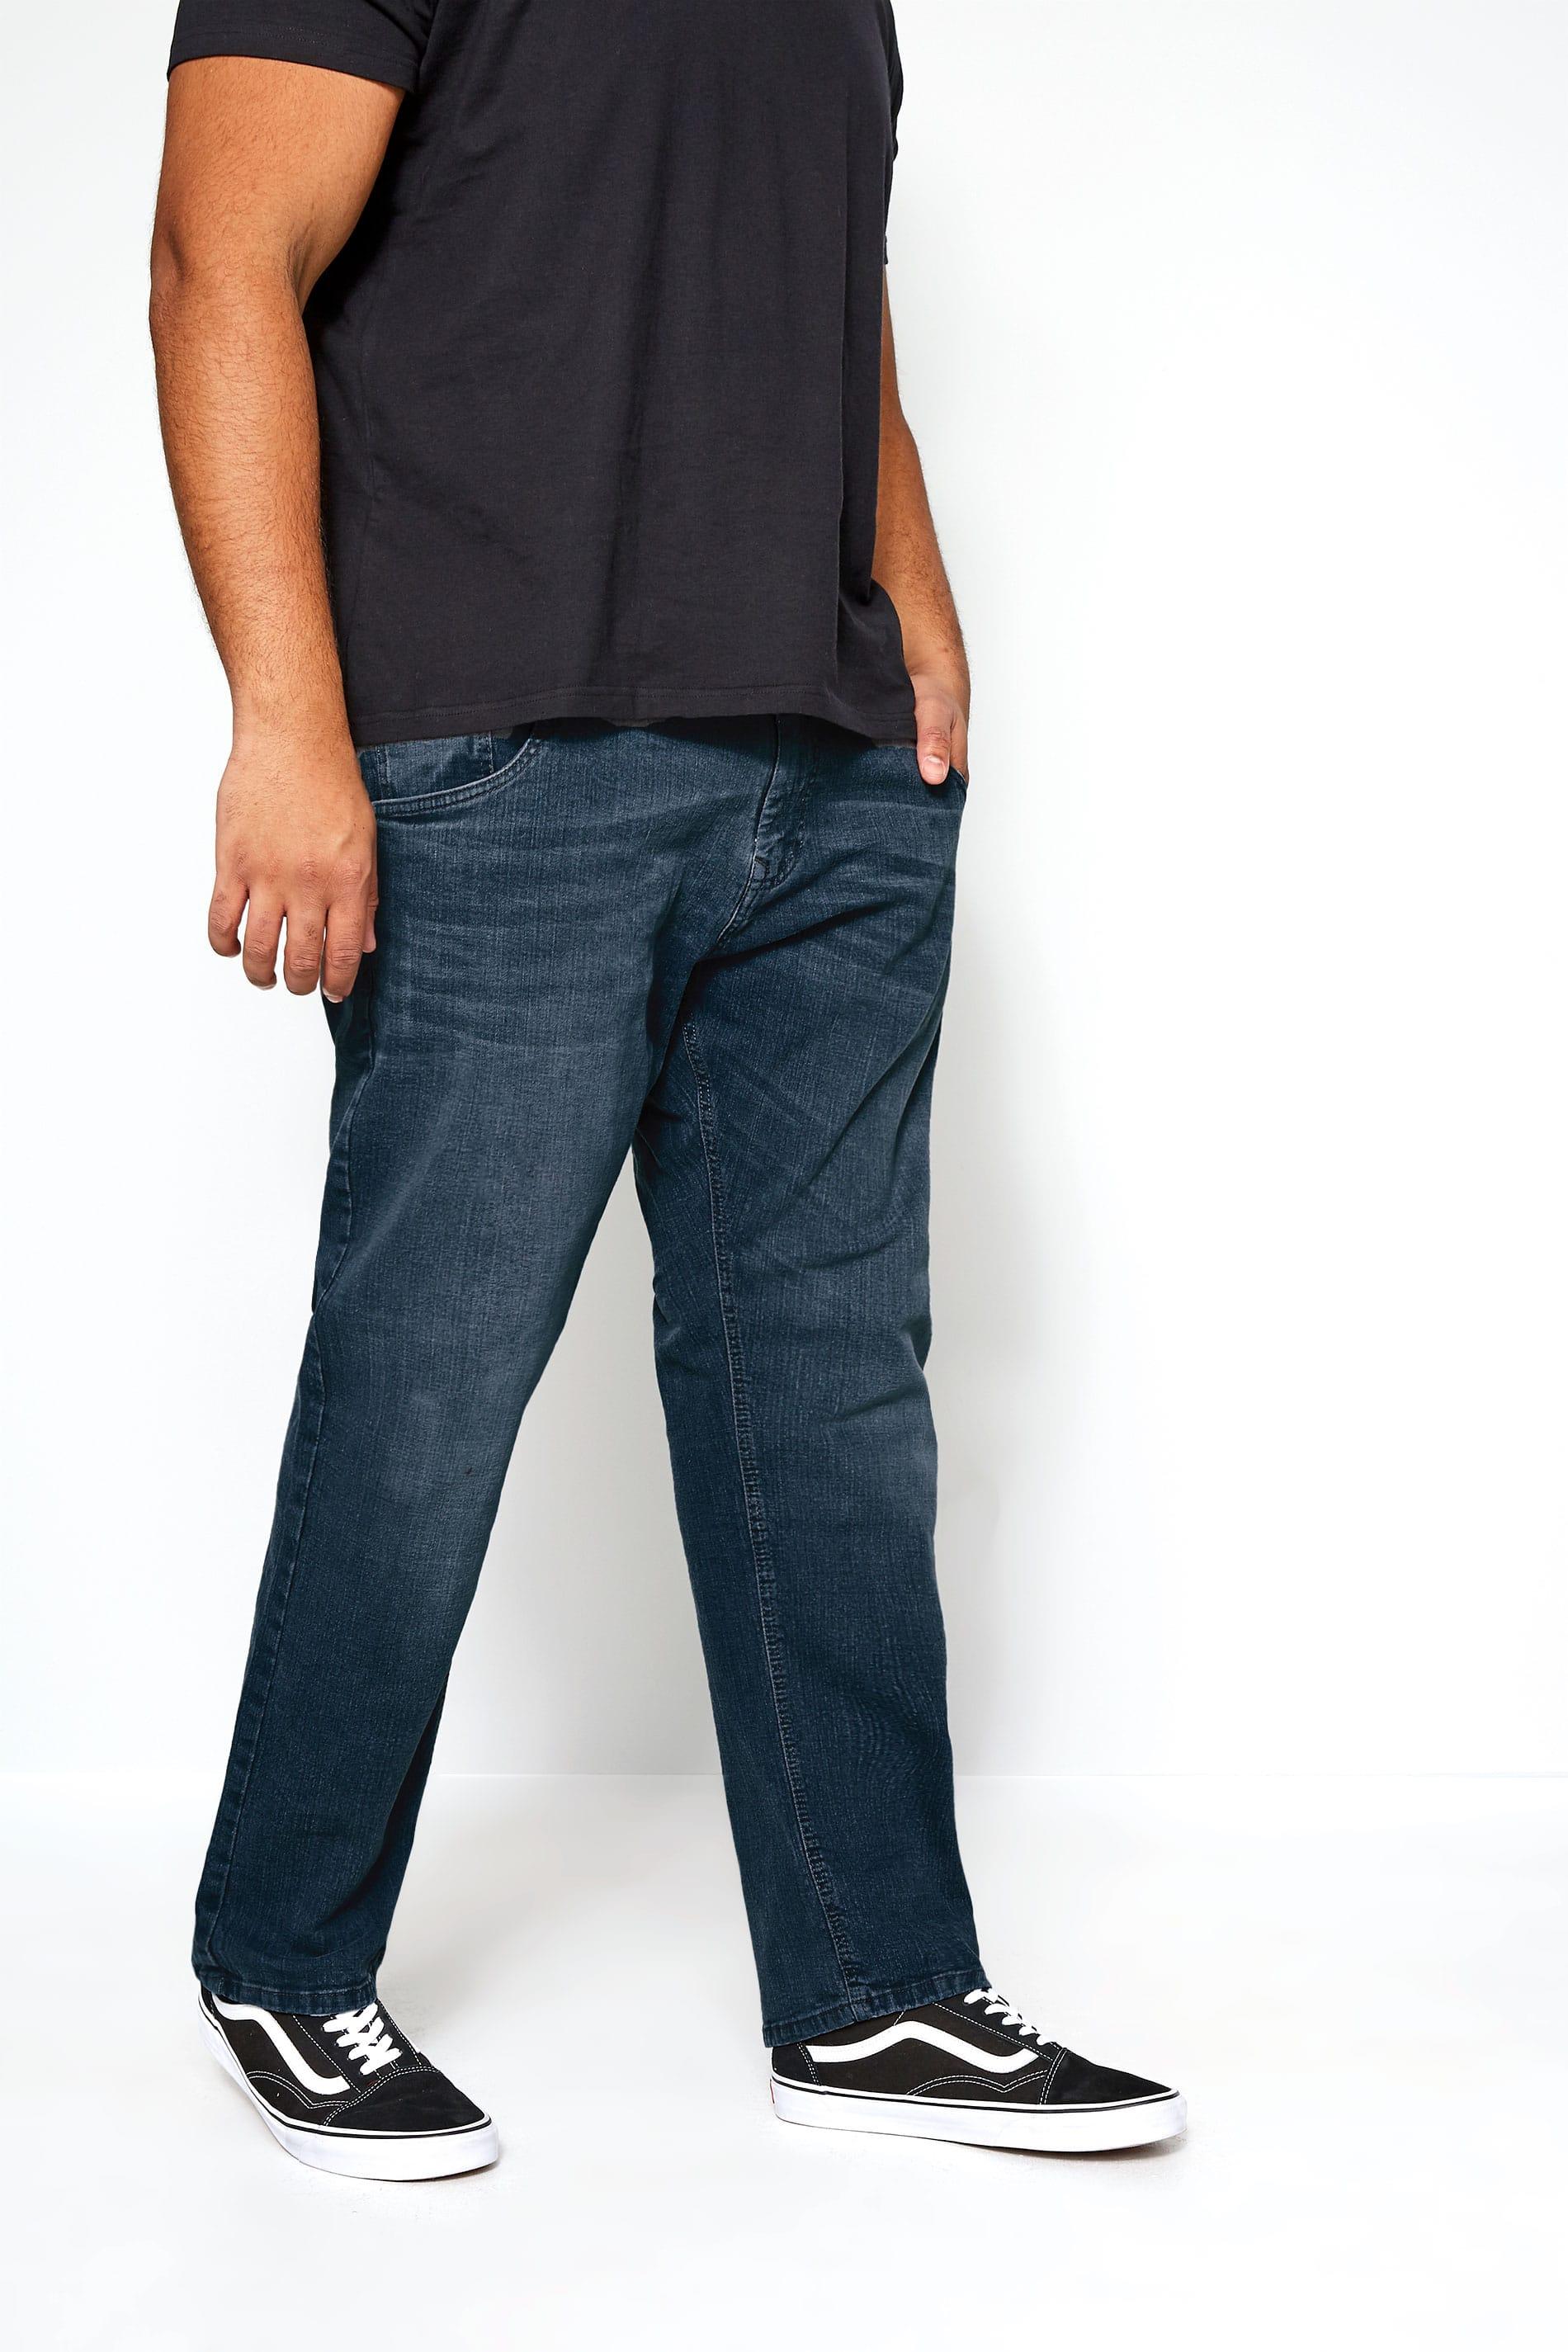 KANGOL Dark Blue Straight Leg Denim Jeans